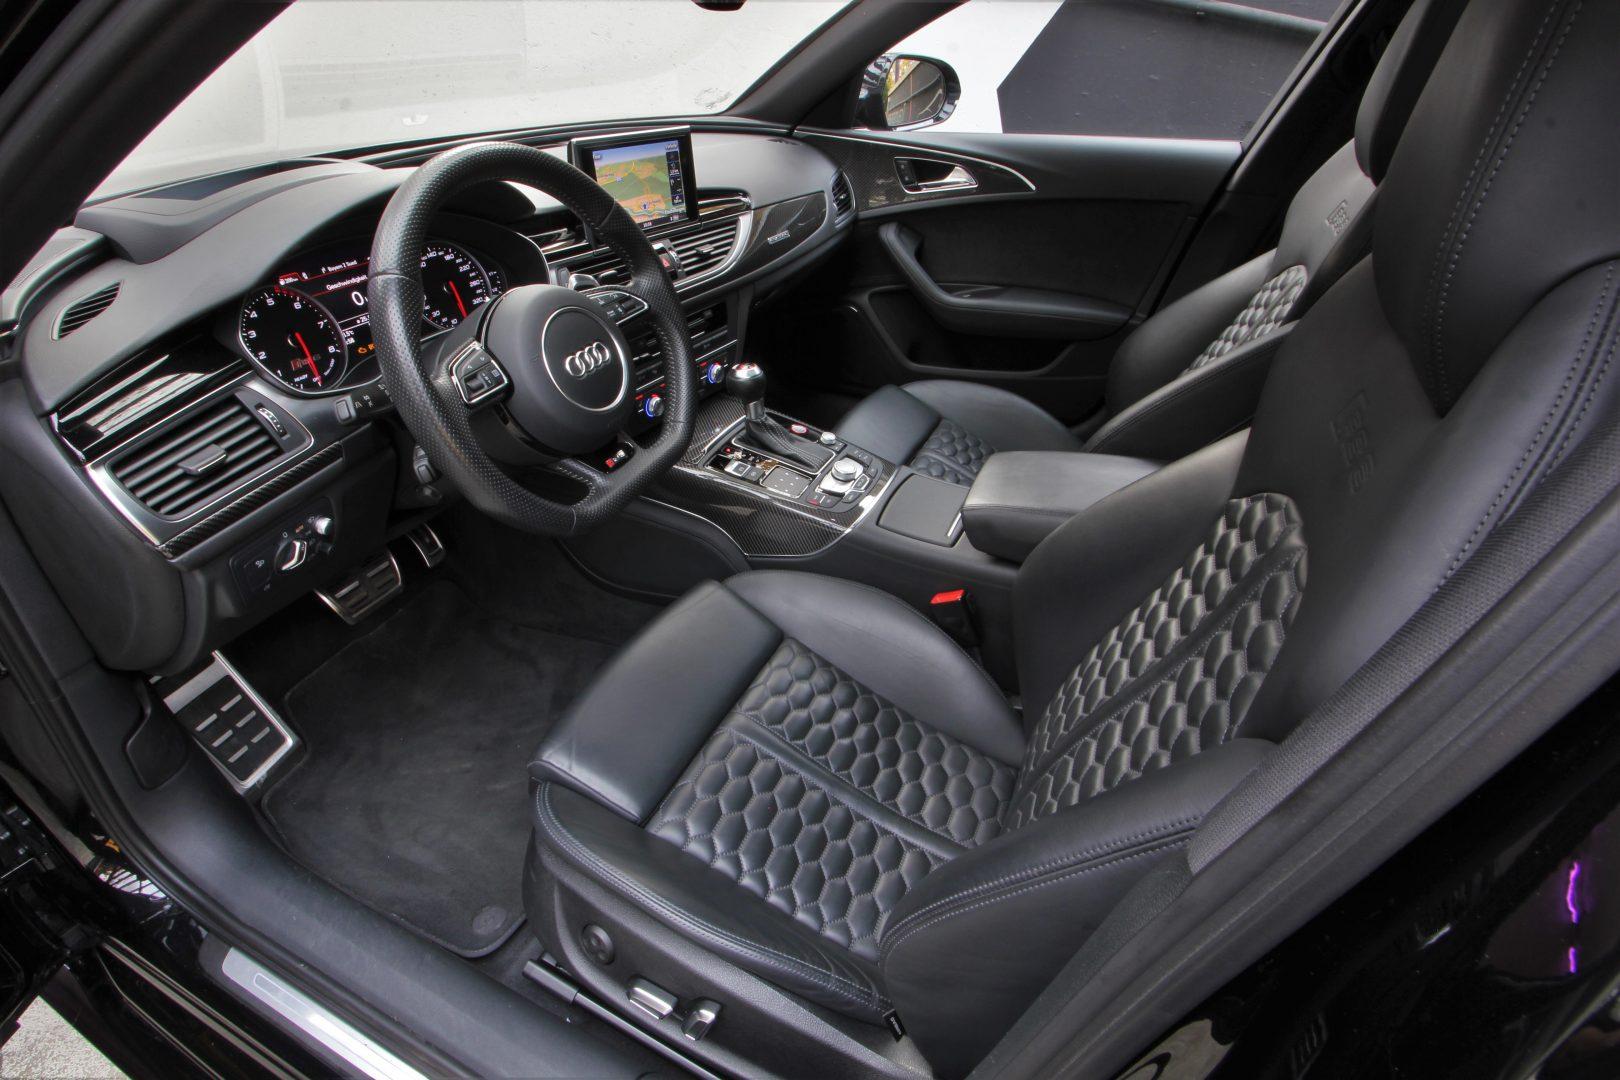 AIL Audi RS6 Avant Performance 4.0 TFSI Carbon Paket  5